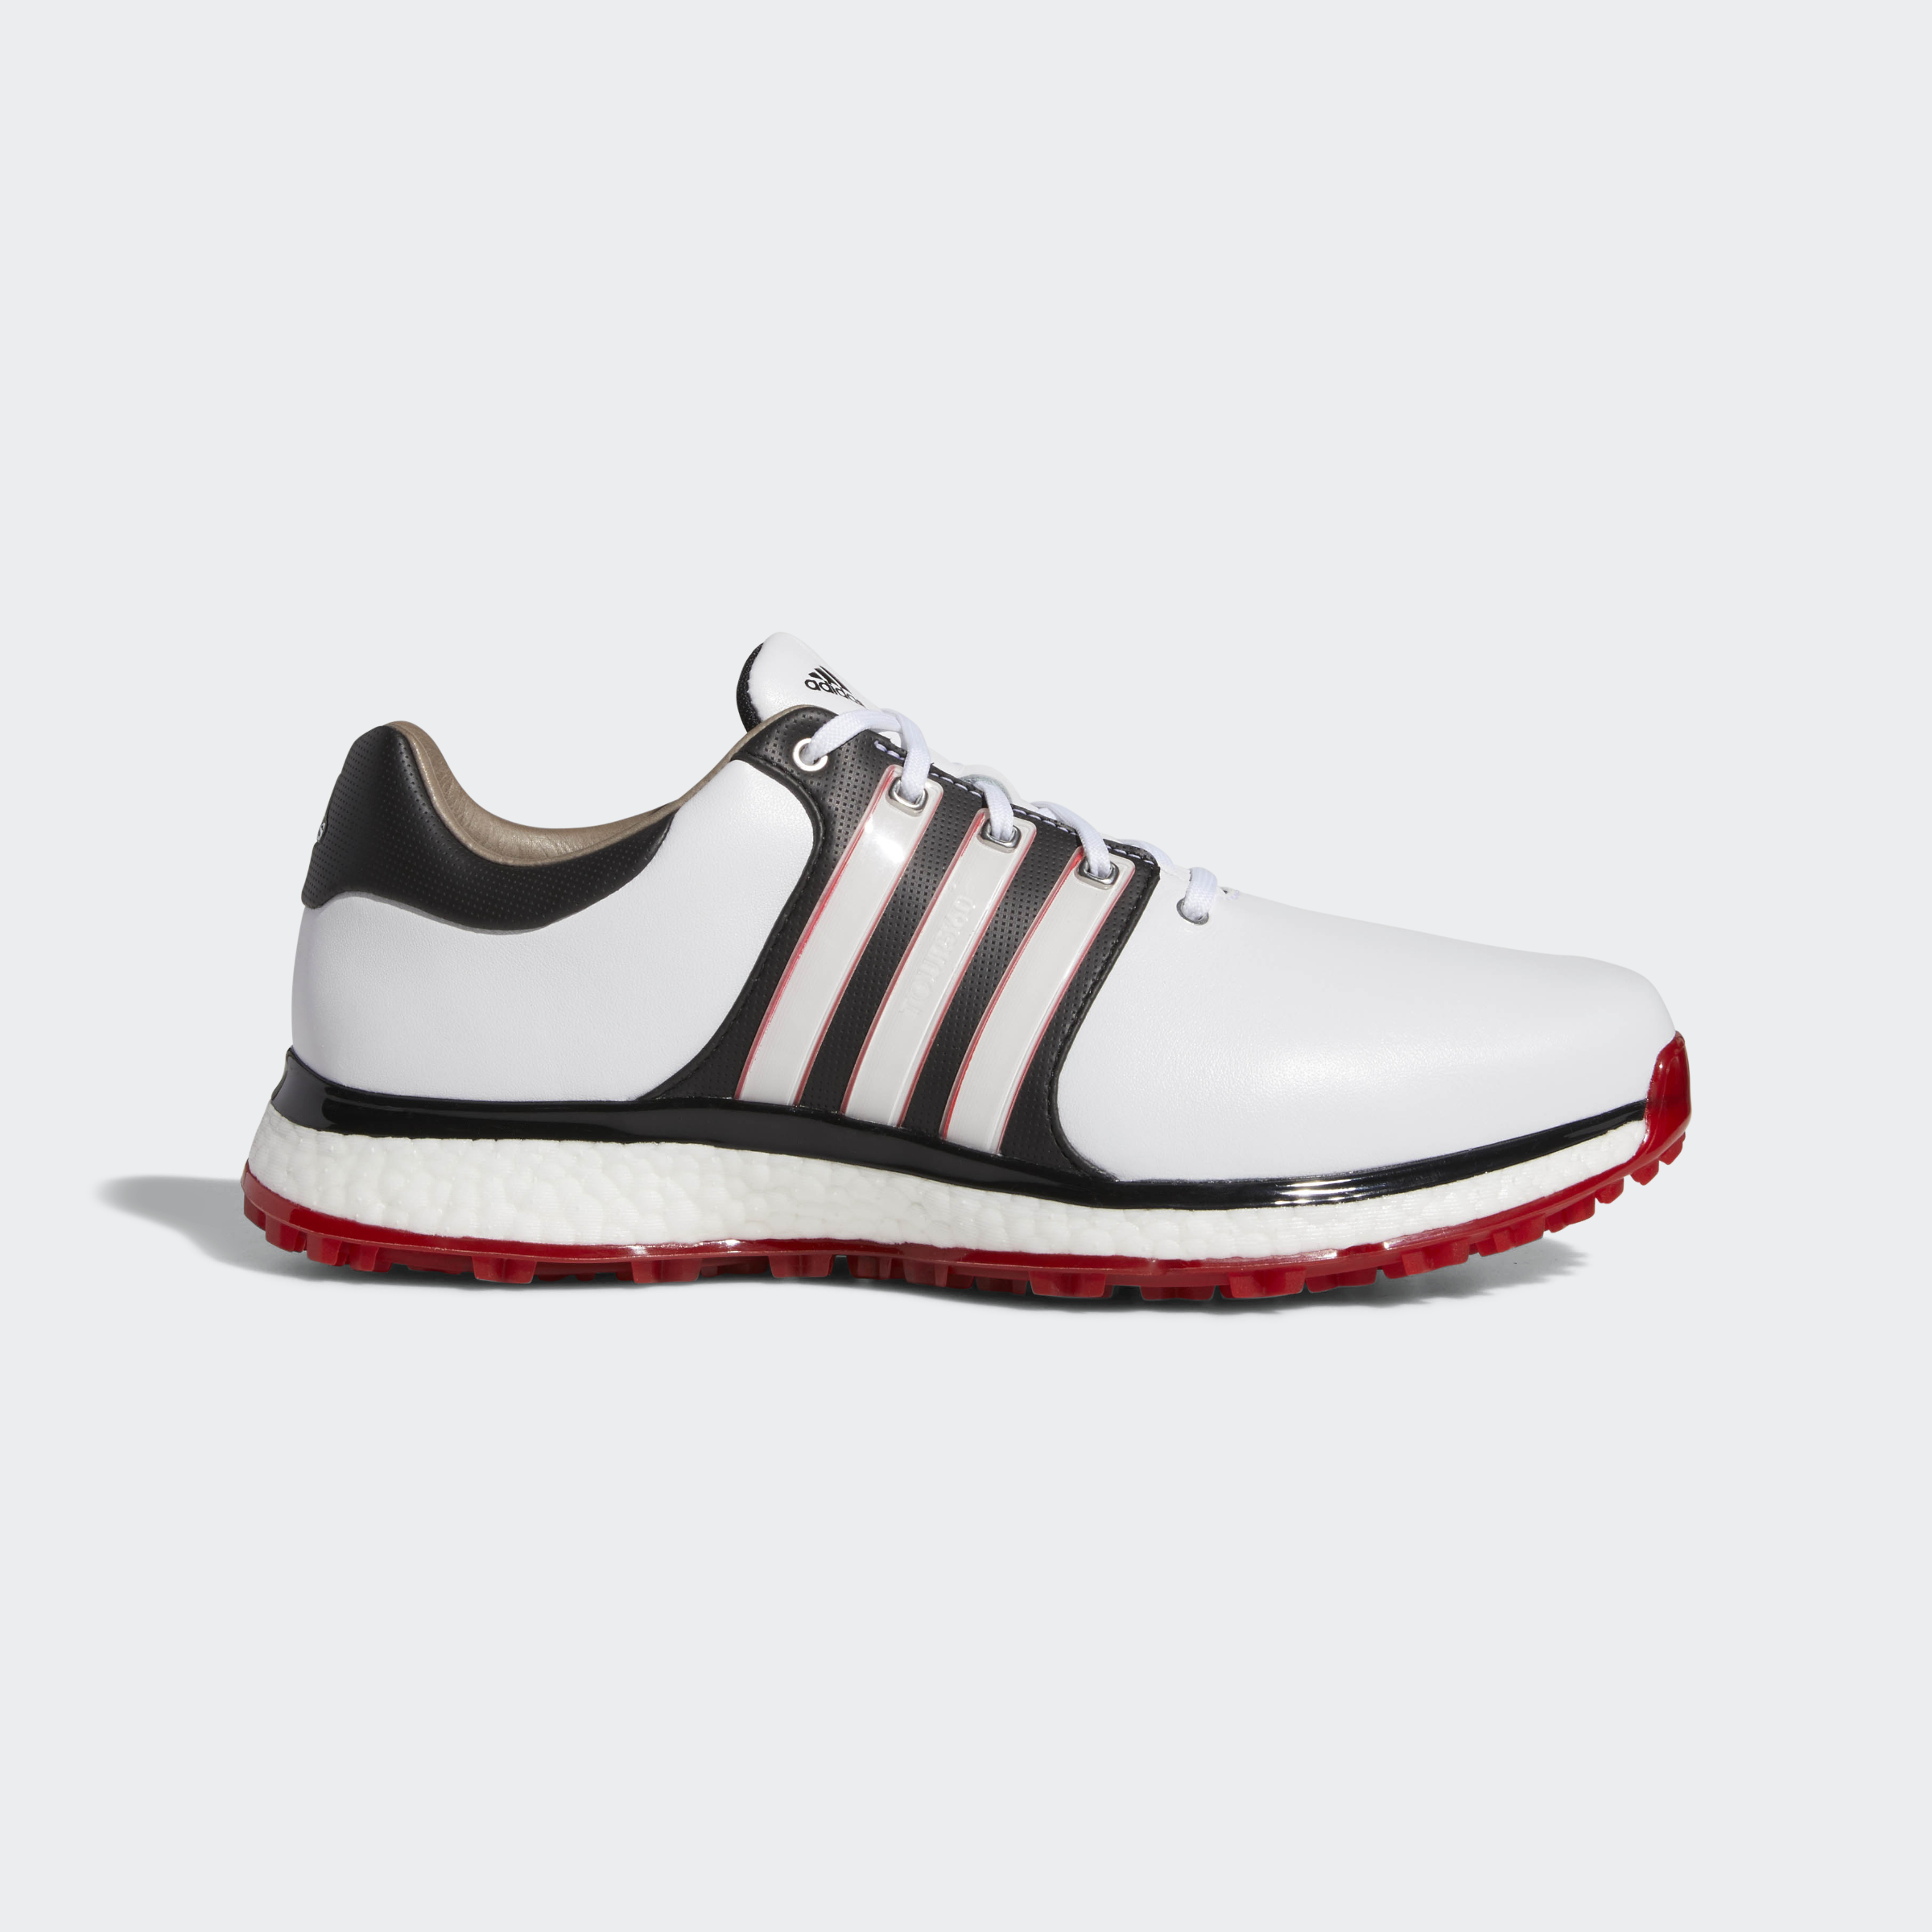 new concept e43d9 fdddf Golf Shoes for Men  South Africa  adidas Official Shop